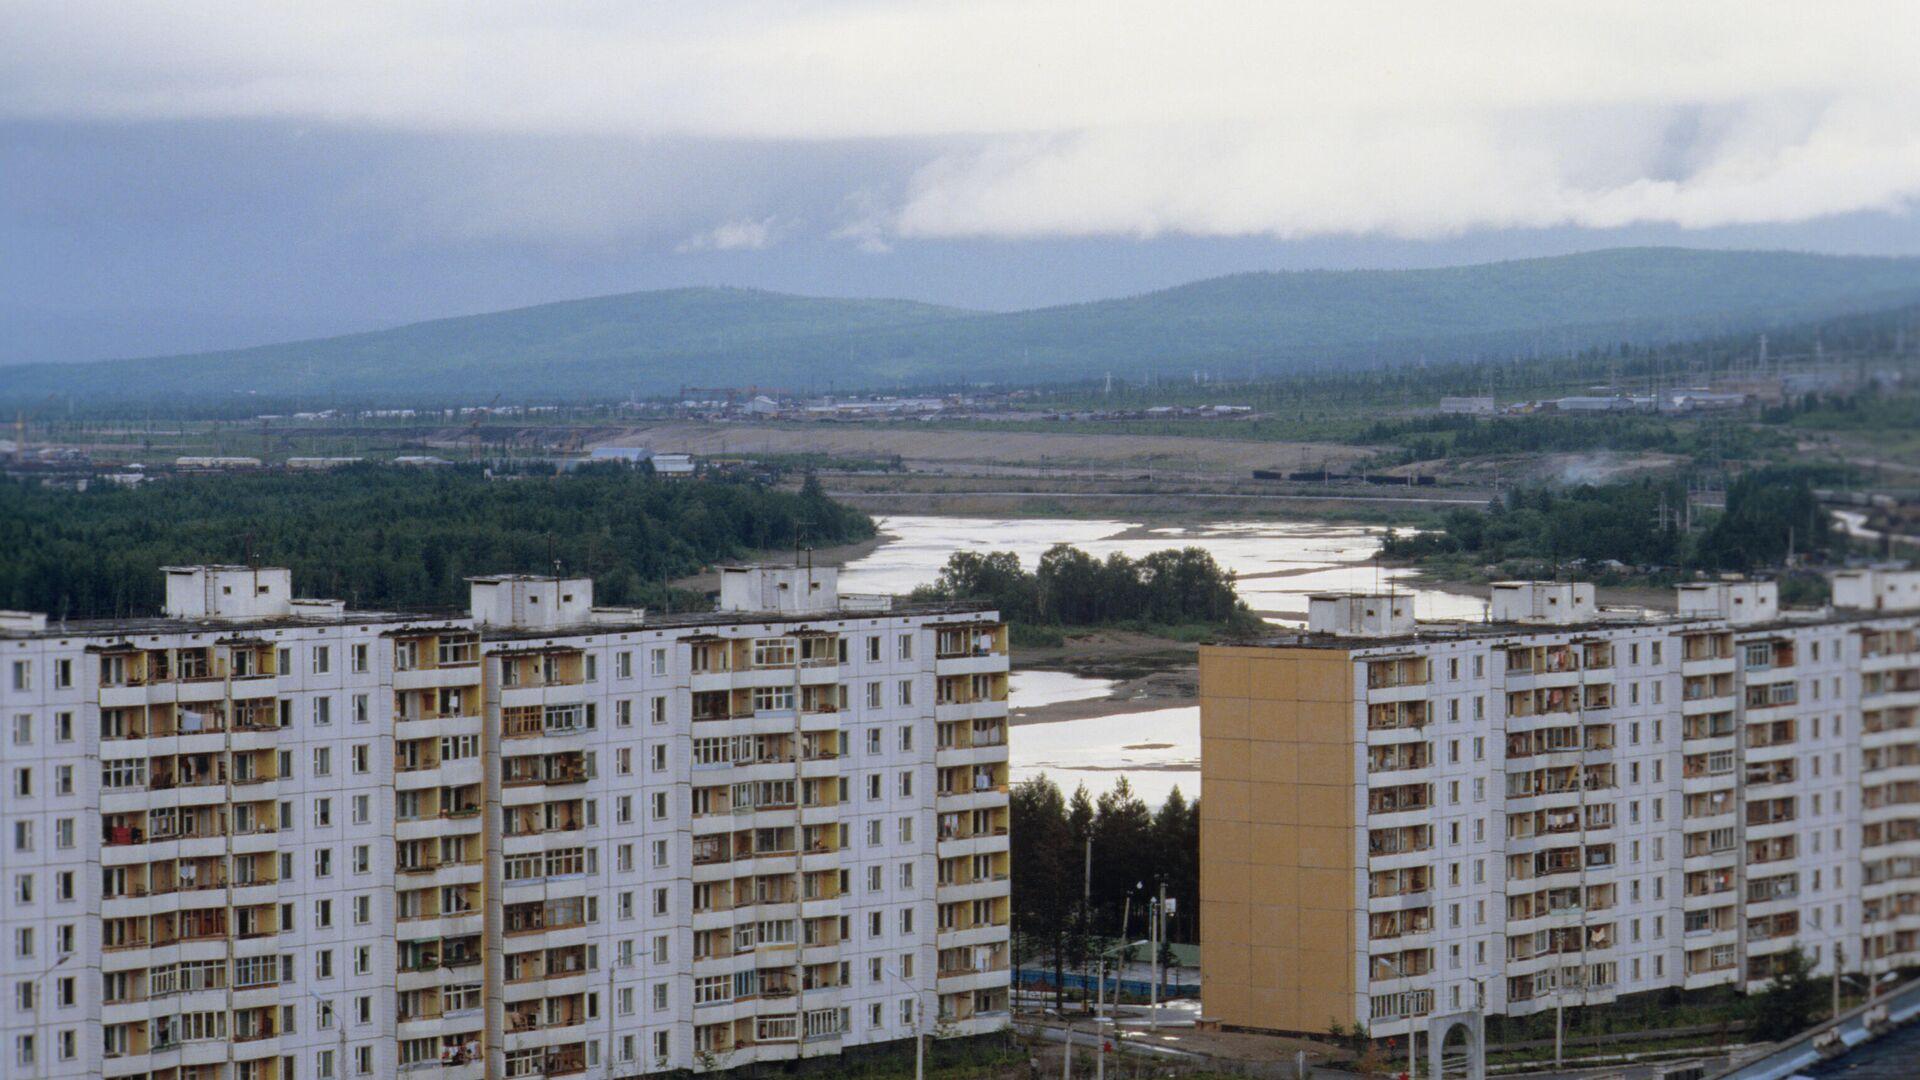 Город Тында – столица БАМа - РИА Новости, 1920, 09.03.2021